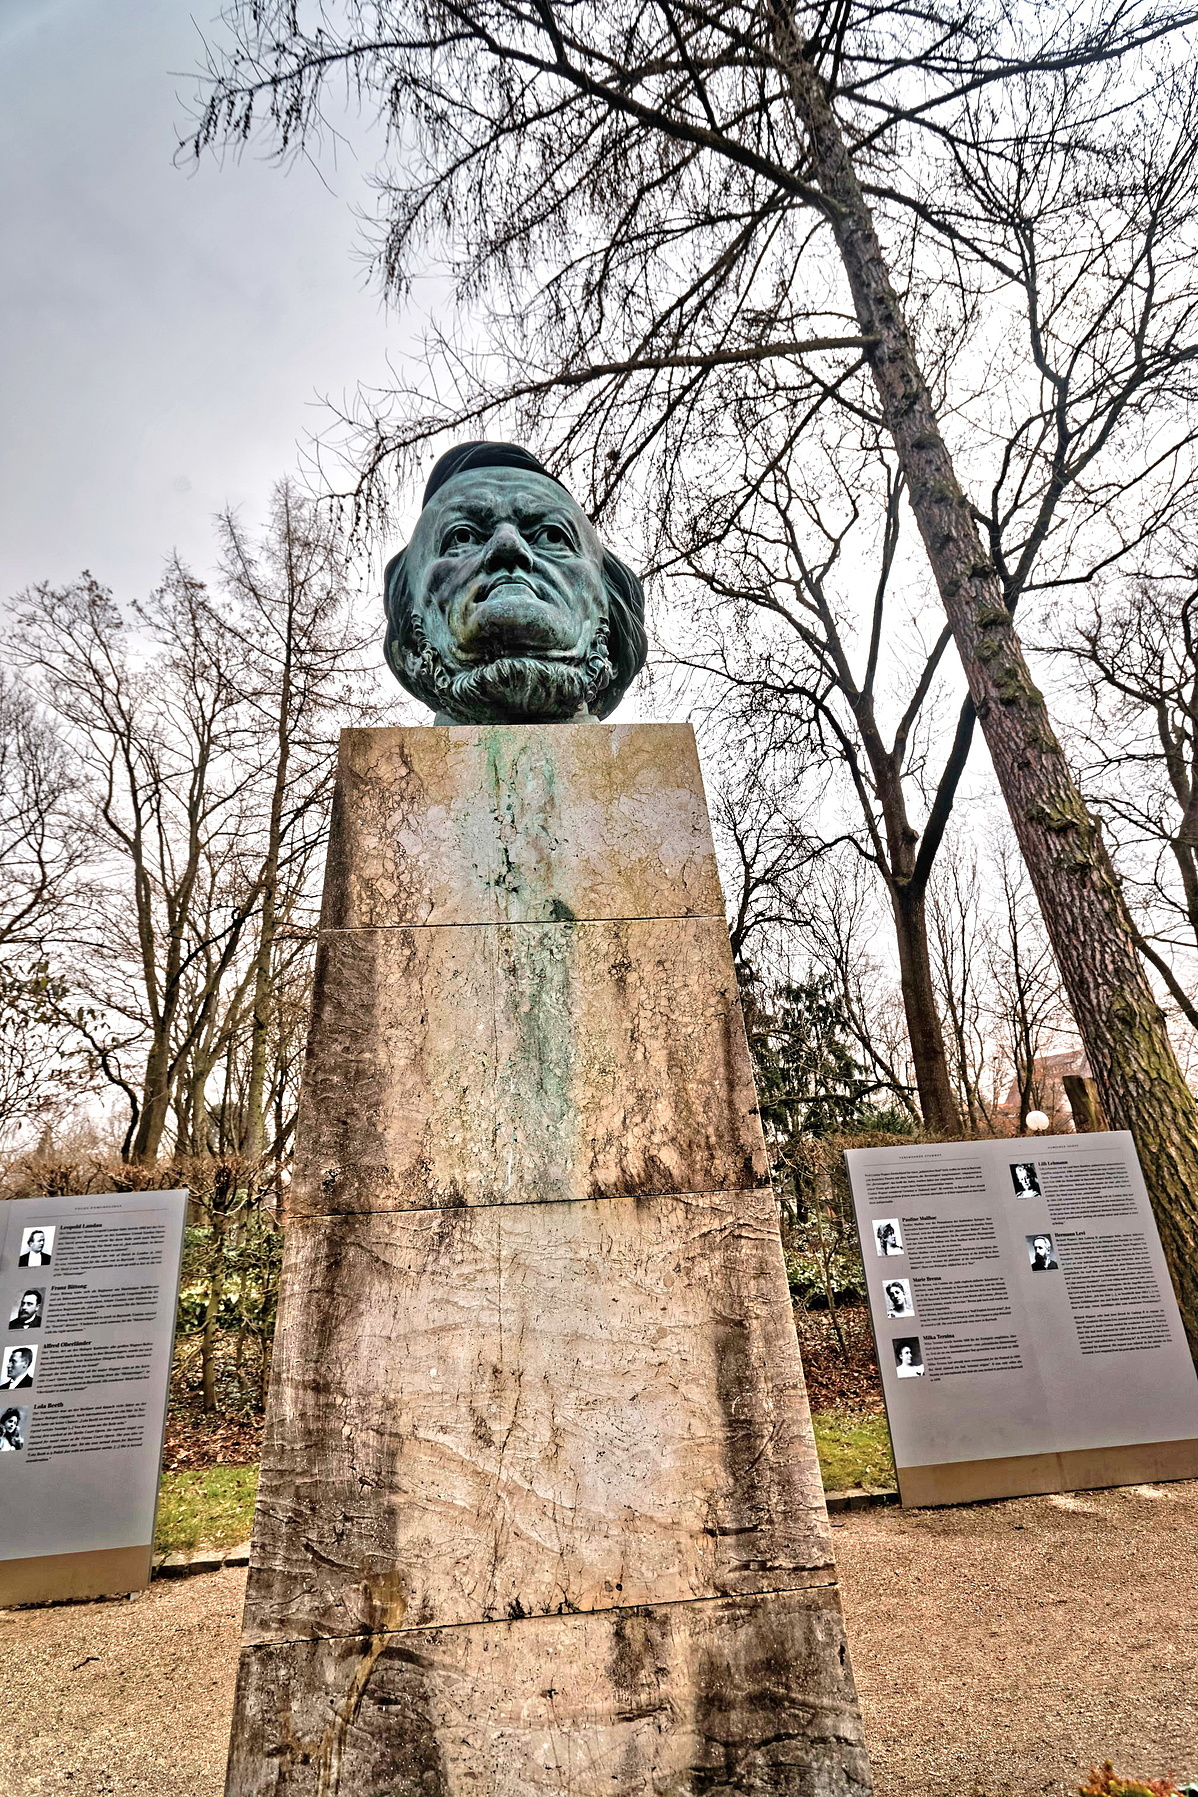 Bayreuth_-_Gruner_Hugel_-_Richard_Wagner_Park_-_Richard_Wagner_Statue_1986_by_Arno_Breker_2-092243.jpg